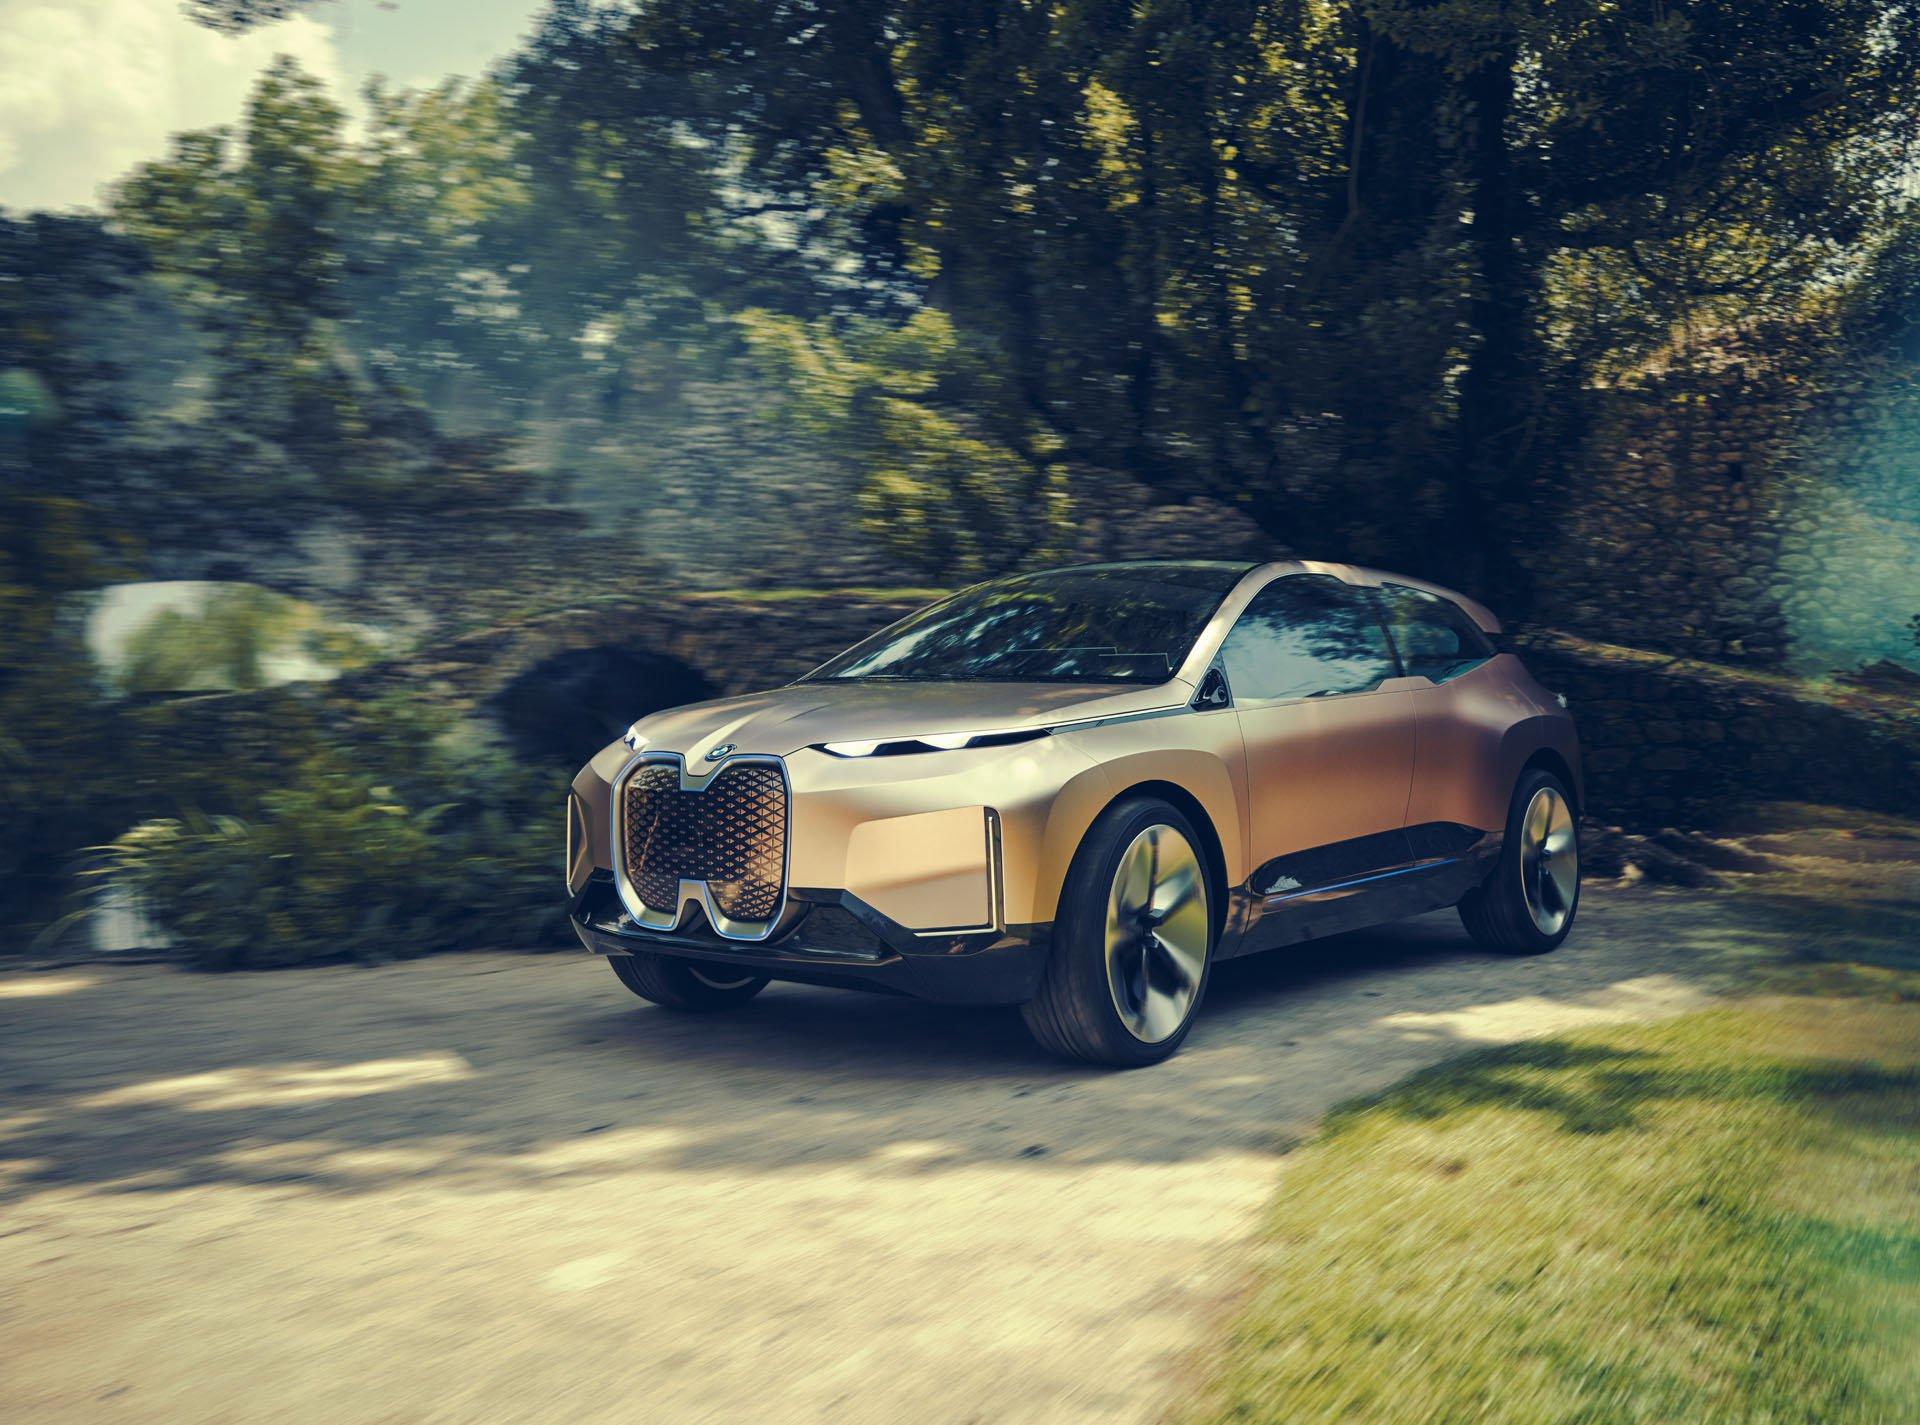 Ова BMW вози самостојно и на струја. Ова е Vision iNext